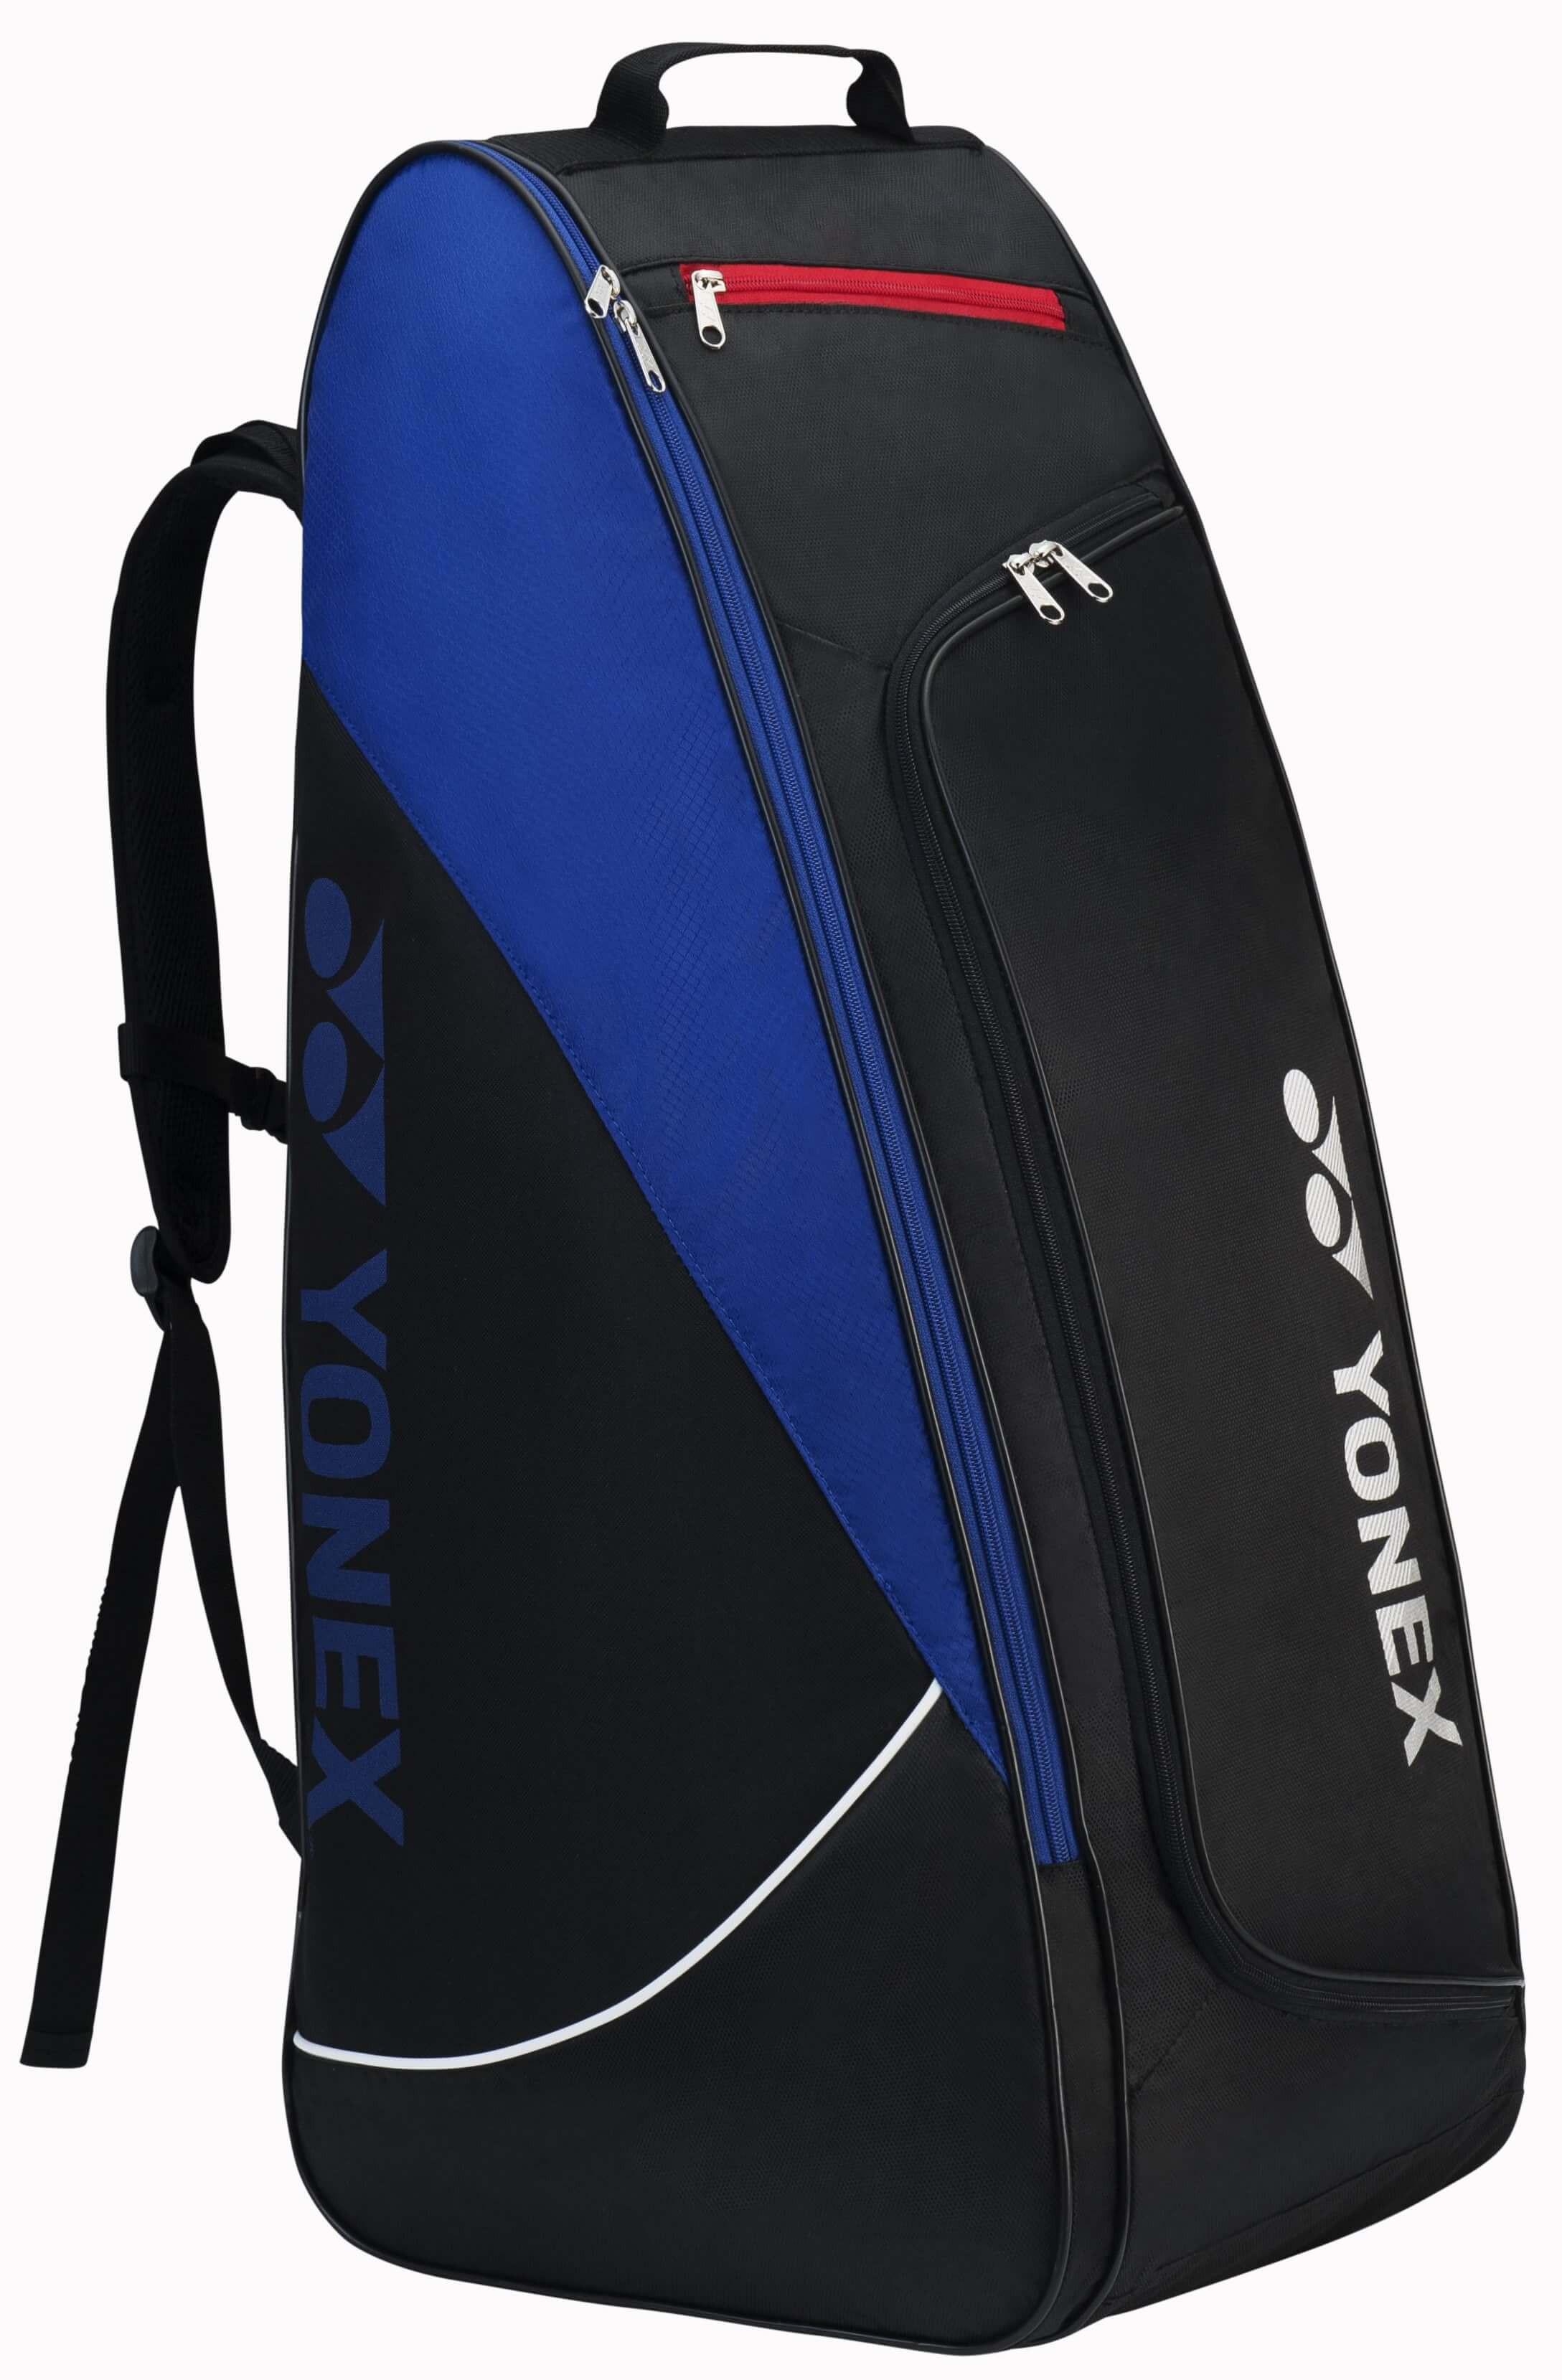 Yonex Sac de sport Sac à Dos Pro 9812 EX 3KjJfduVz